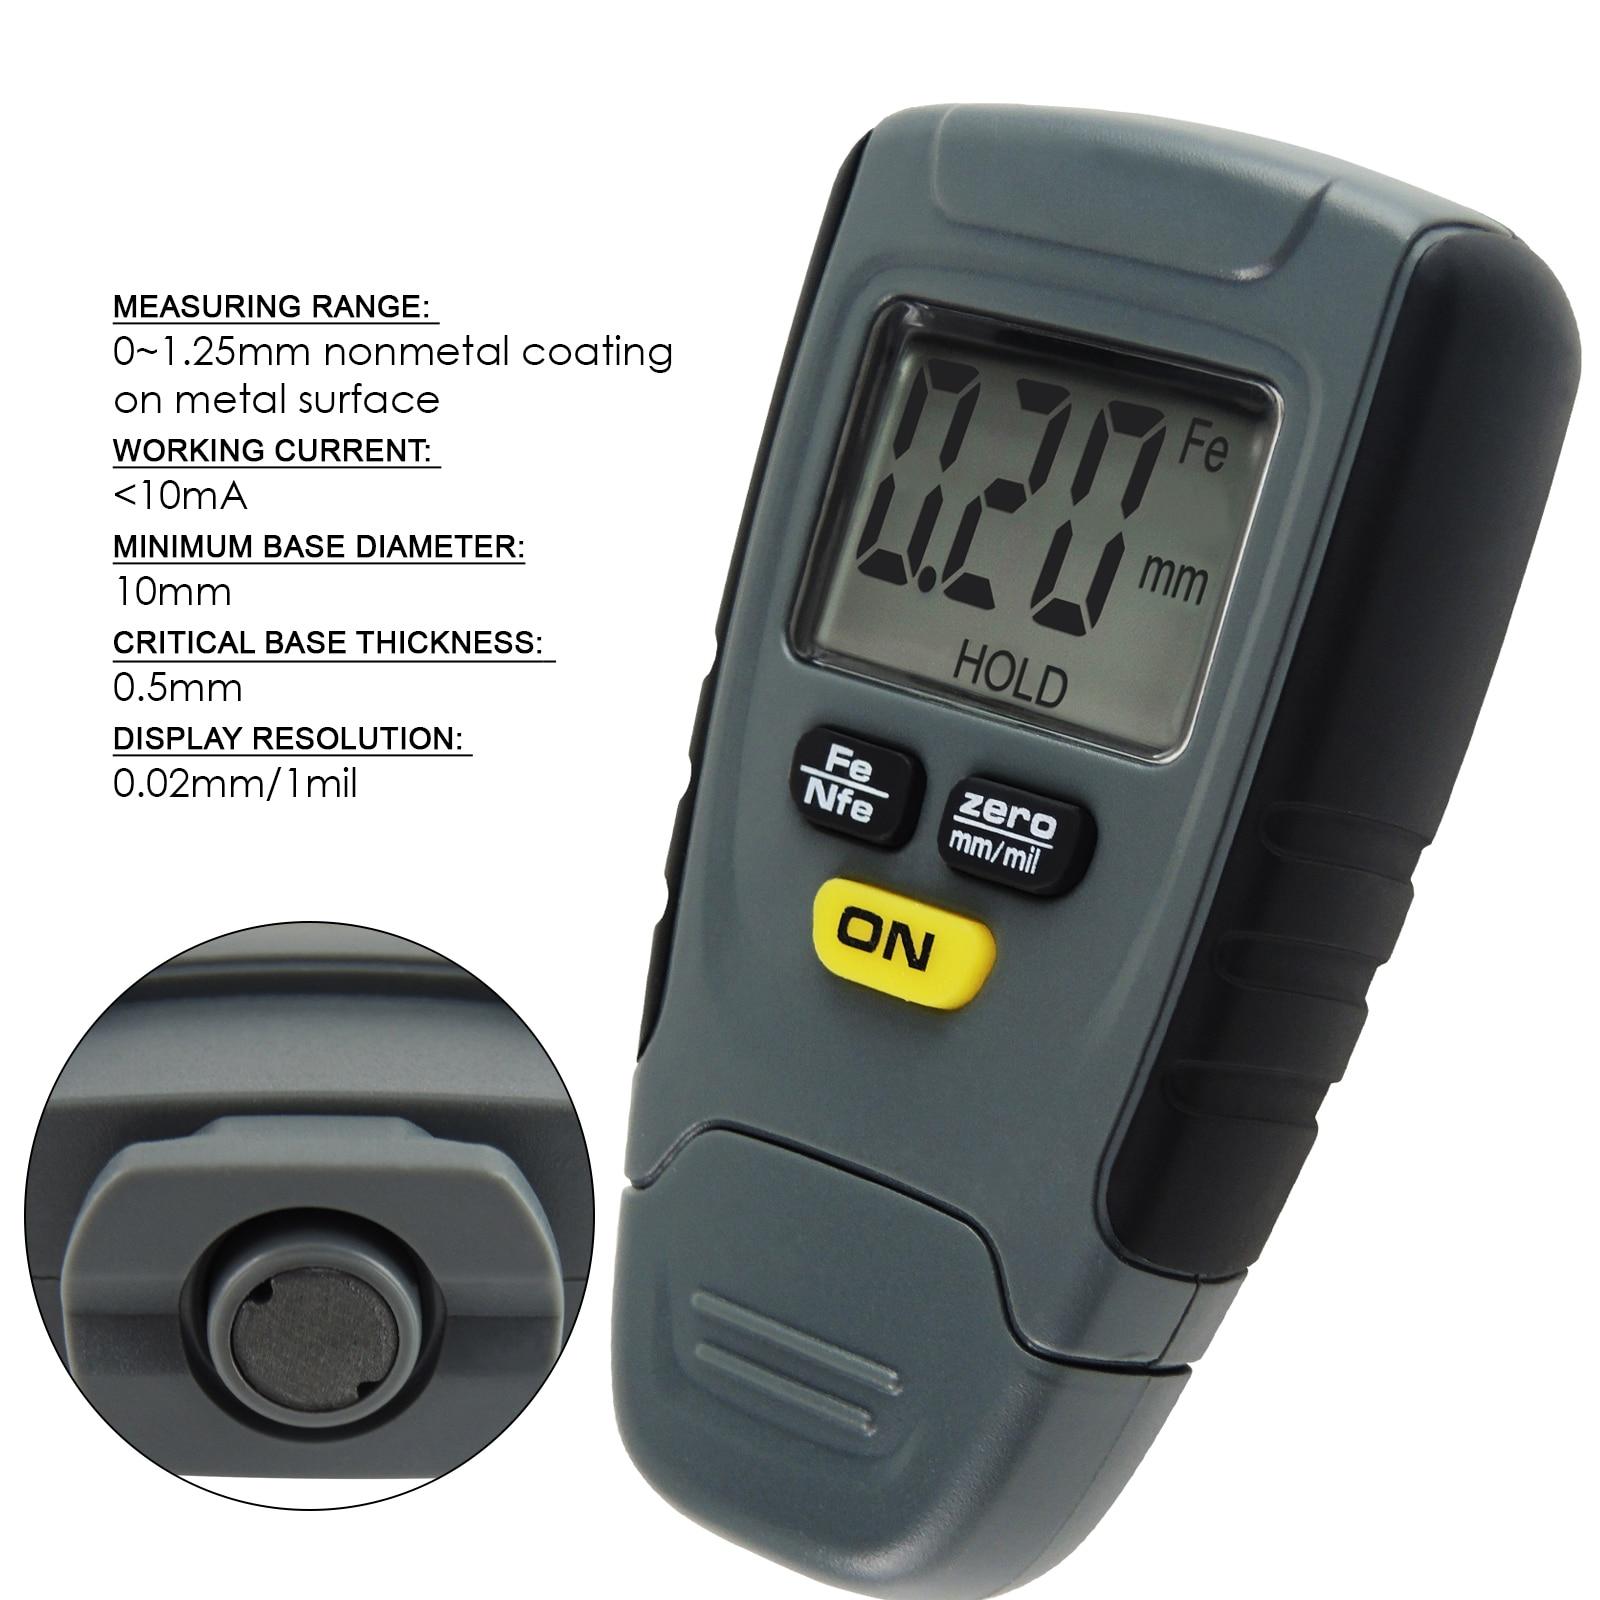 FB 0-20mm car tyre tire tread depth gauge meter measurer tool